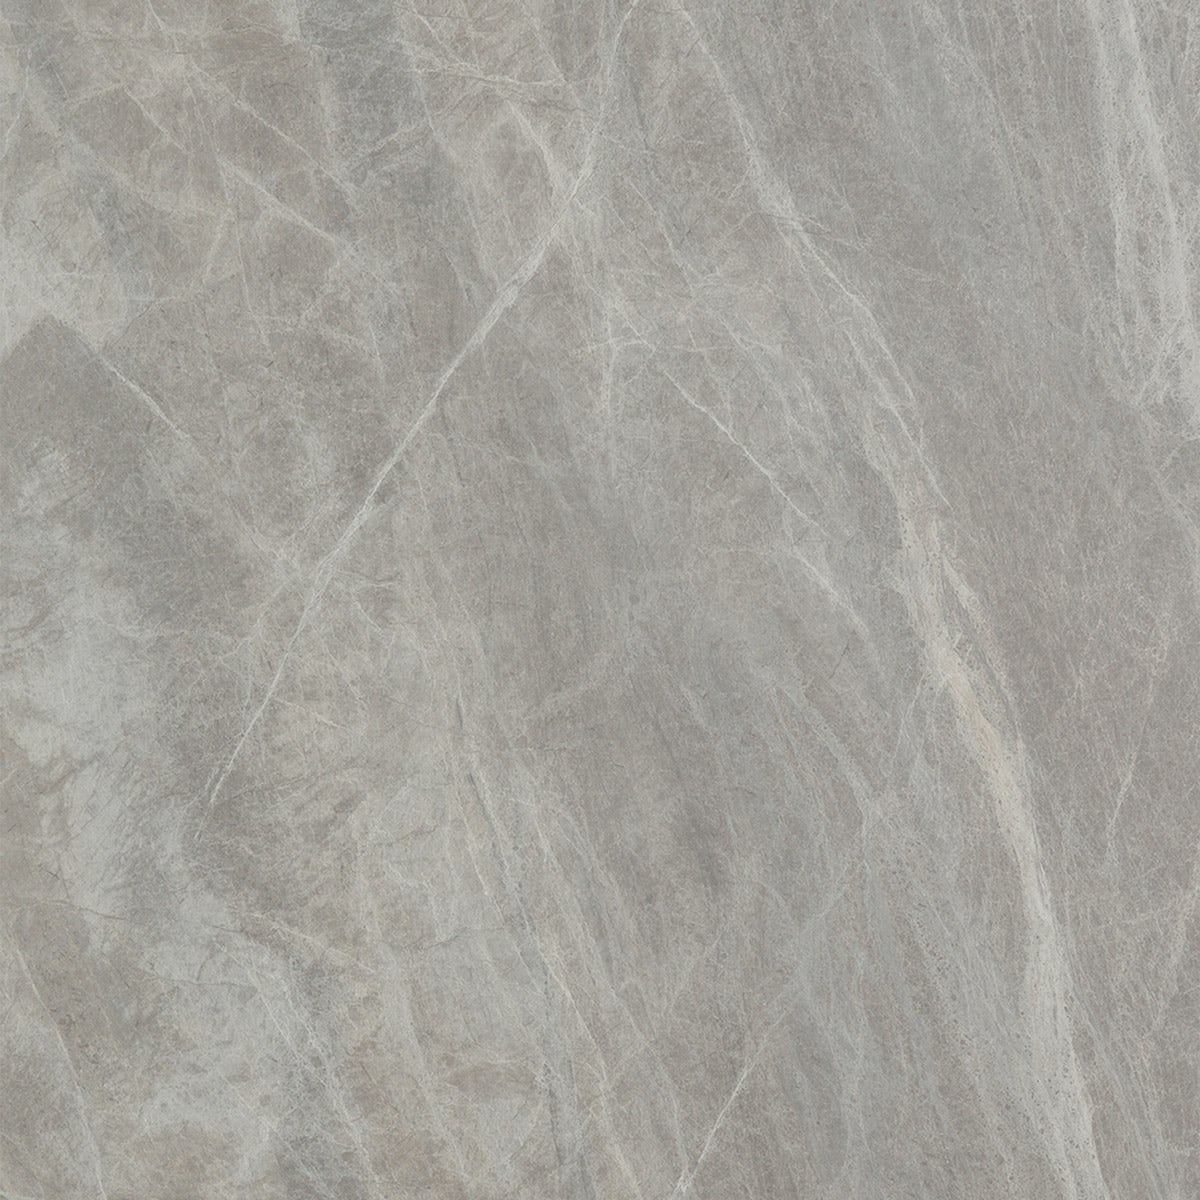 Multipanel Linda Barker Soapstone Stellar unlipped shower wall panel 2400 x 1200